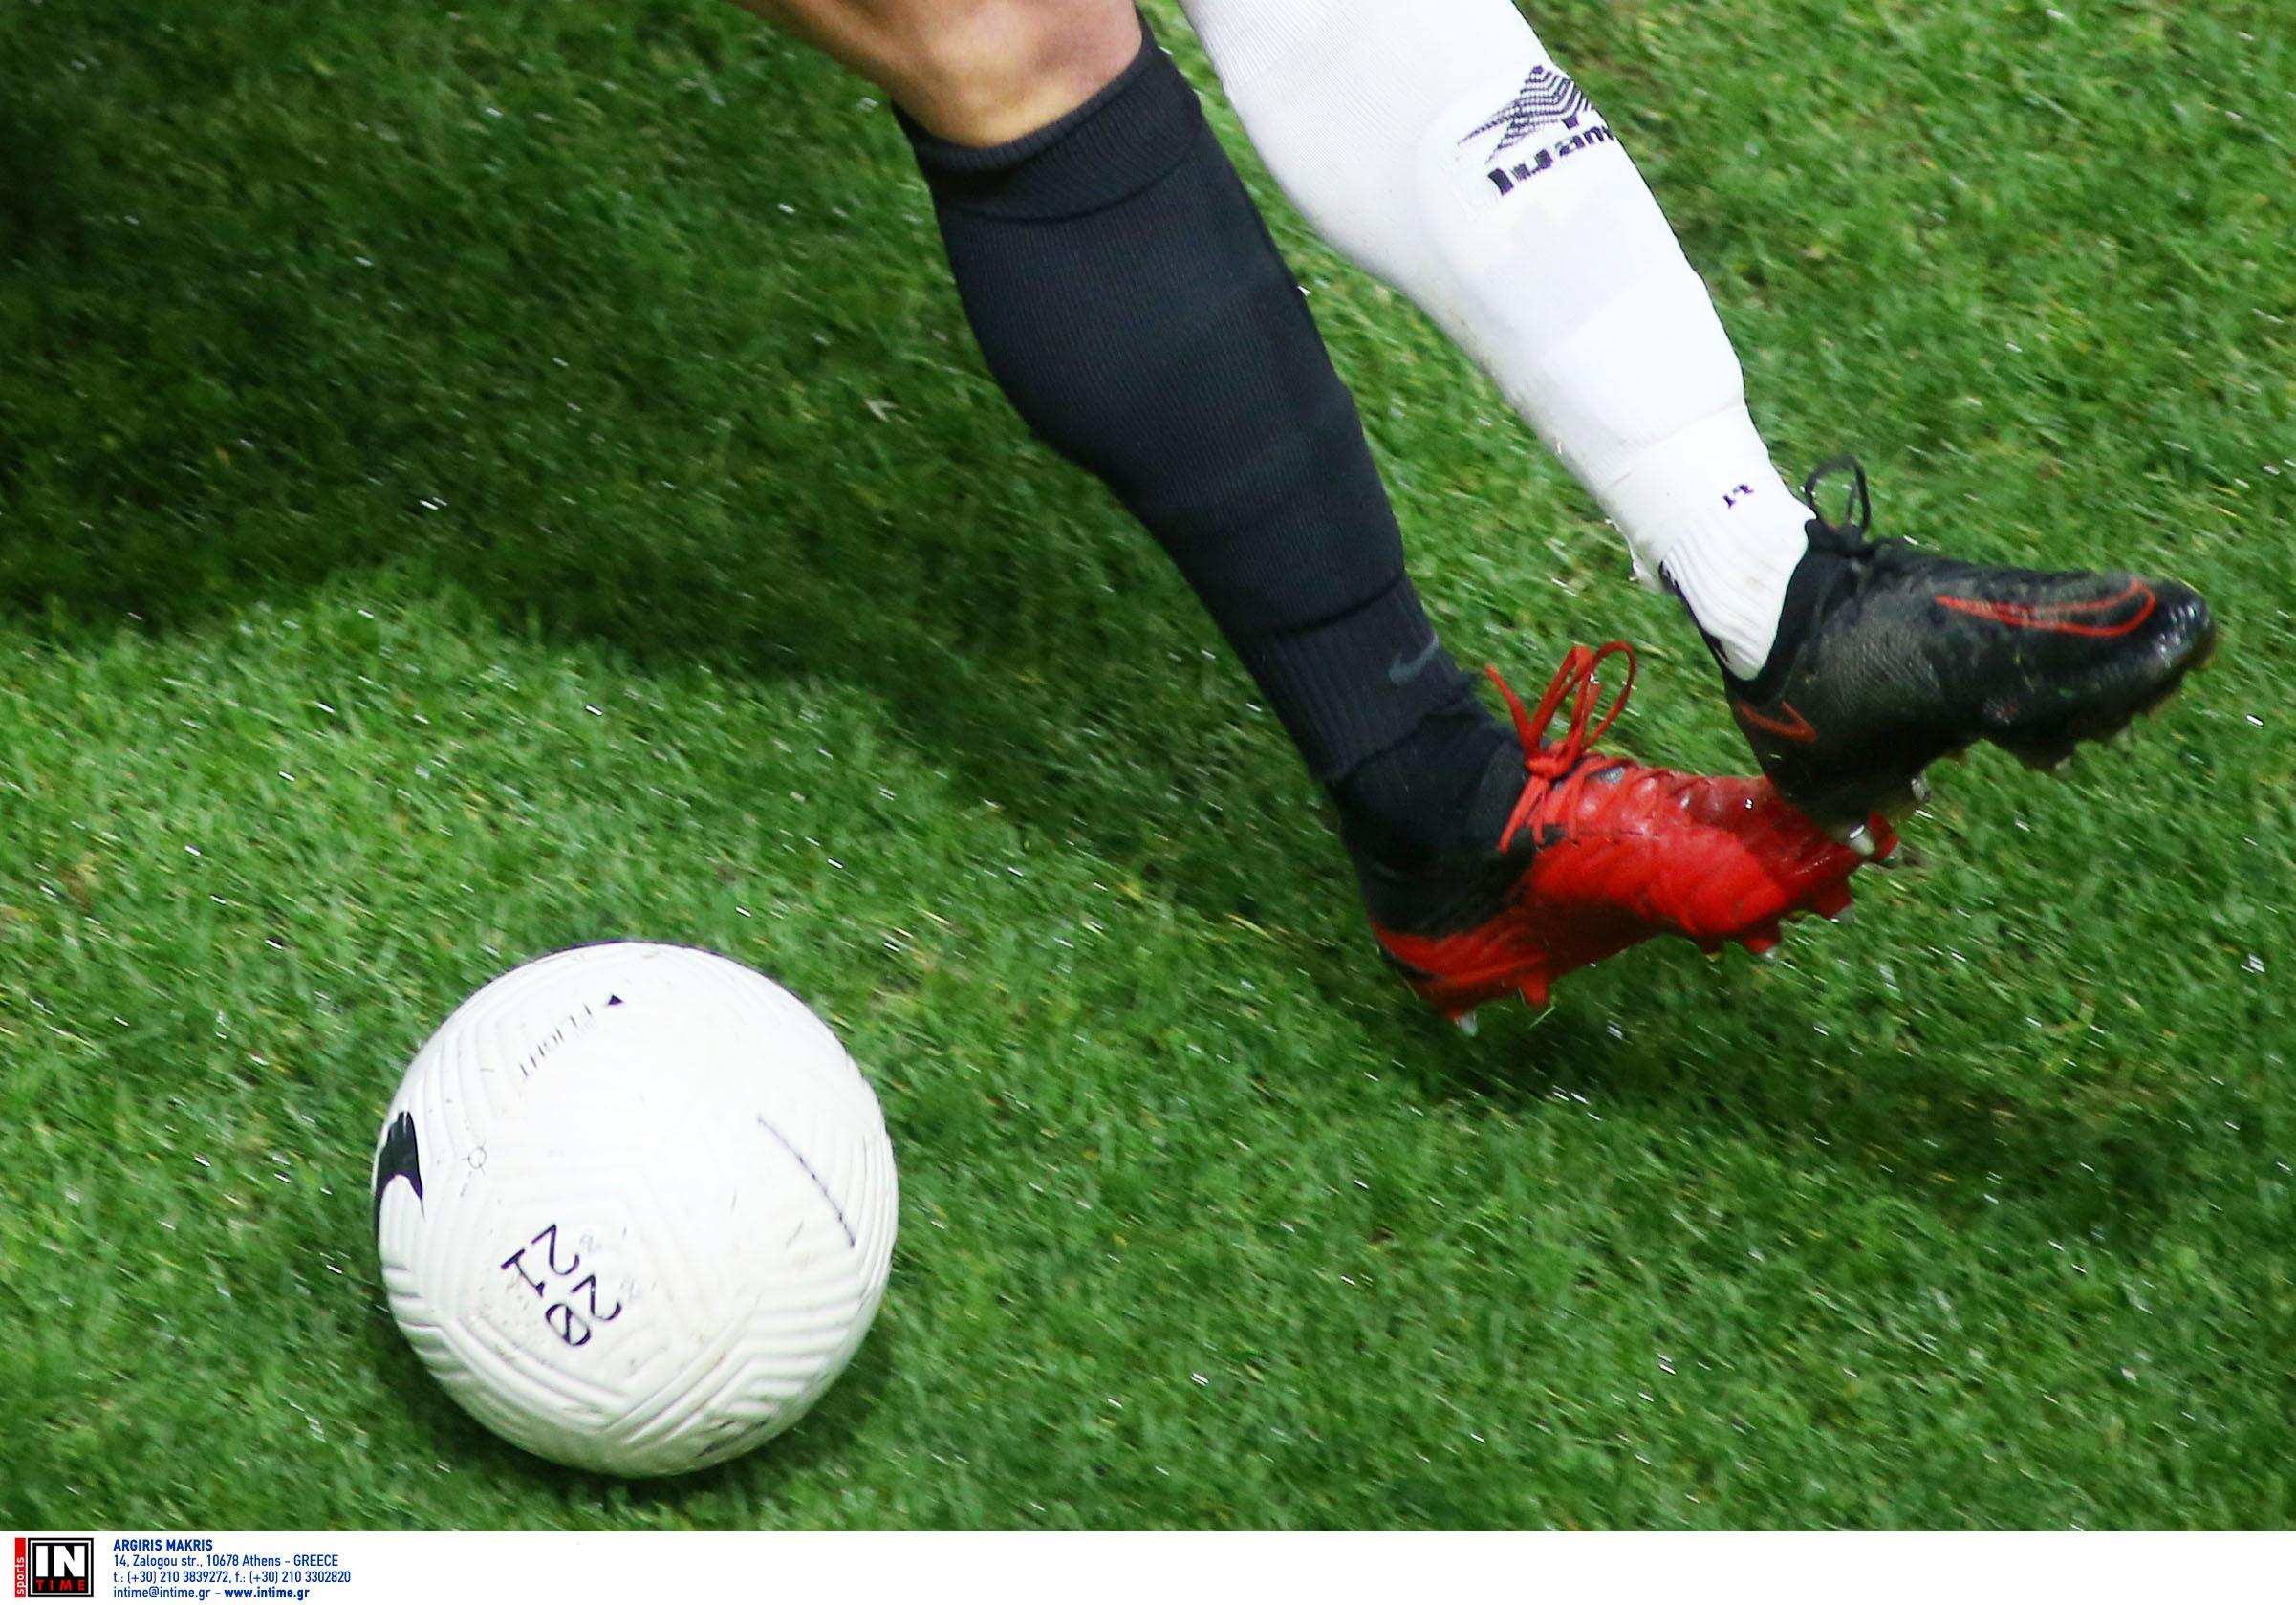 Superleague: Πρωτάθλημα ενός γύρου για τις ομάδες Κ 19